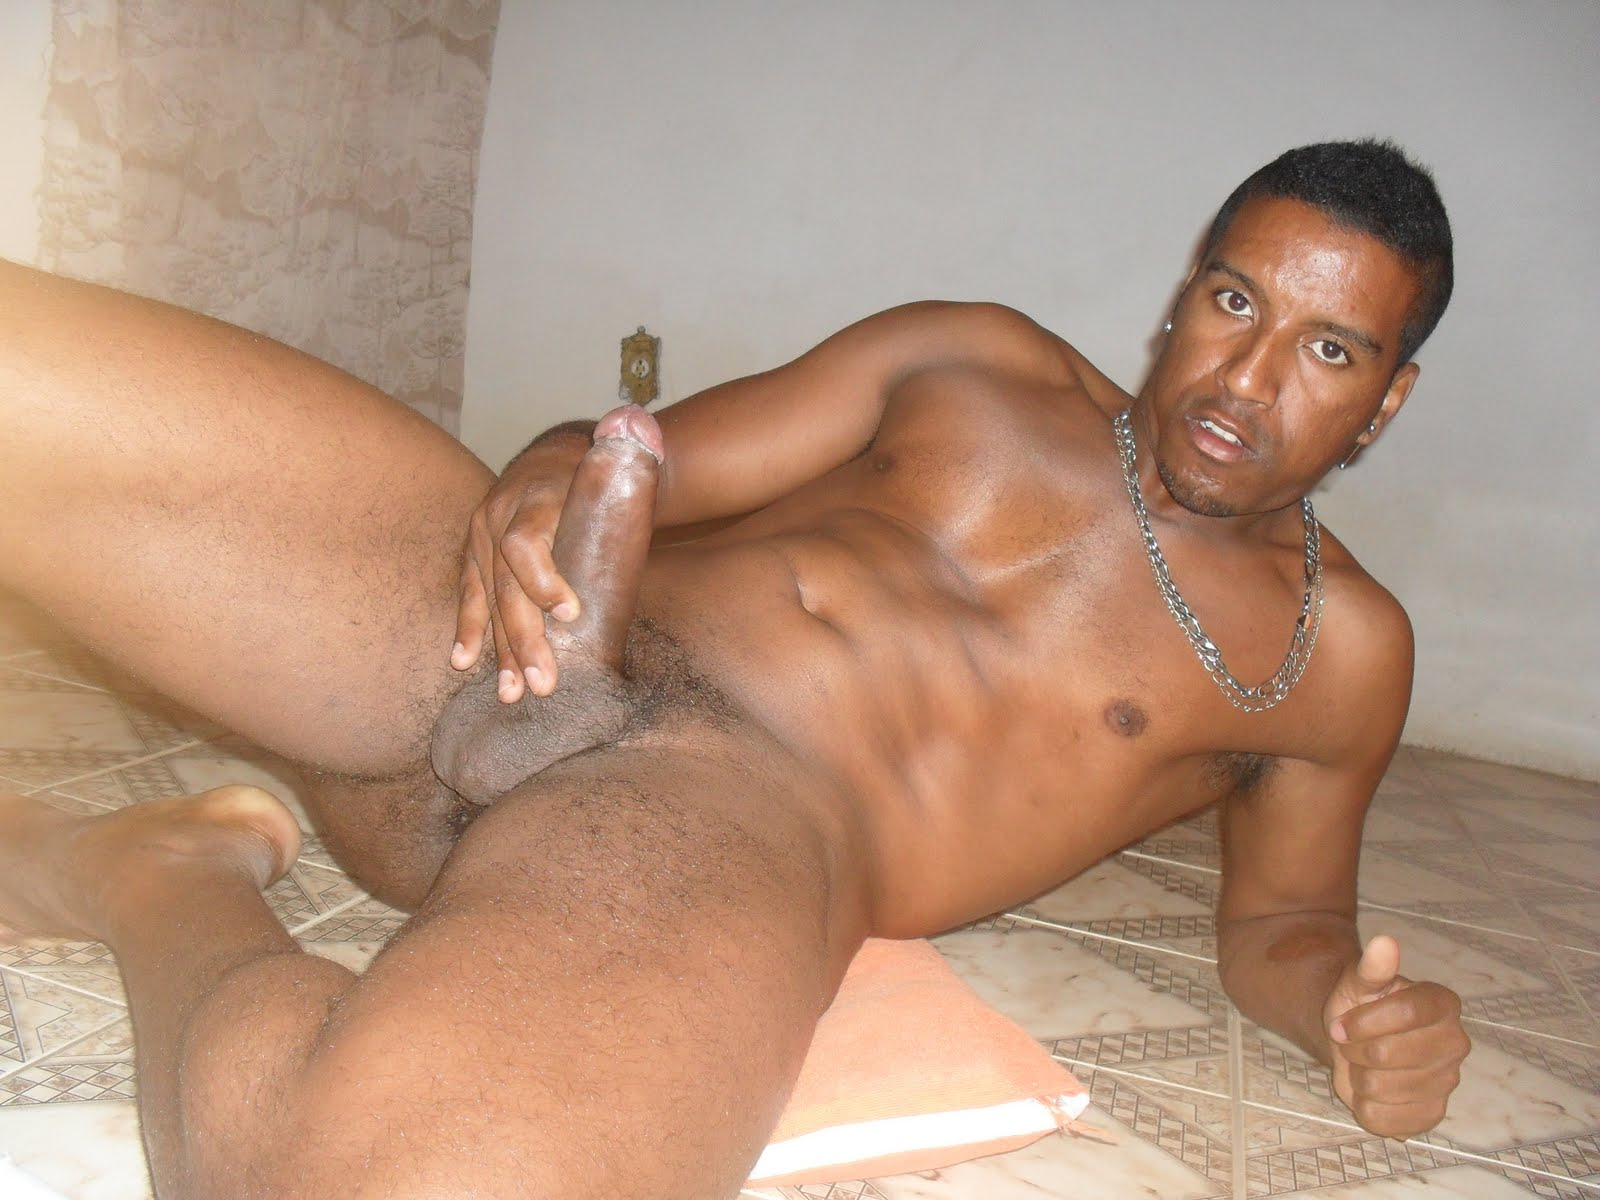 Teen with huge clitoris